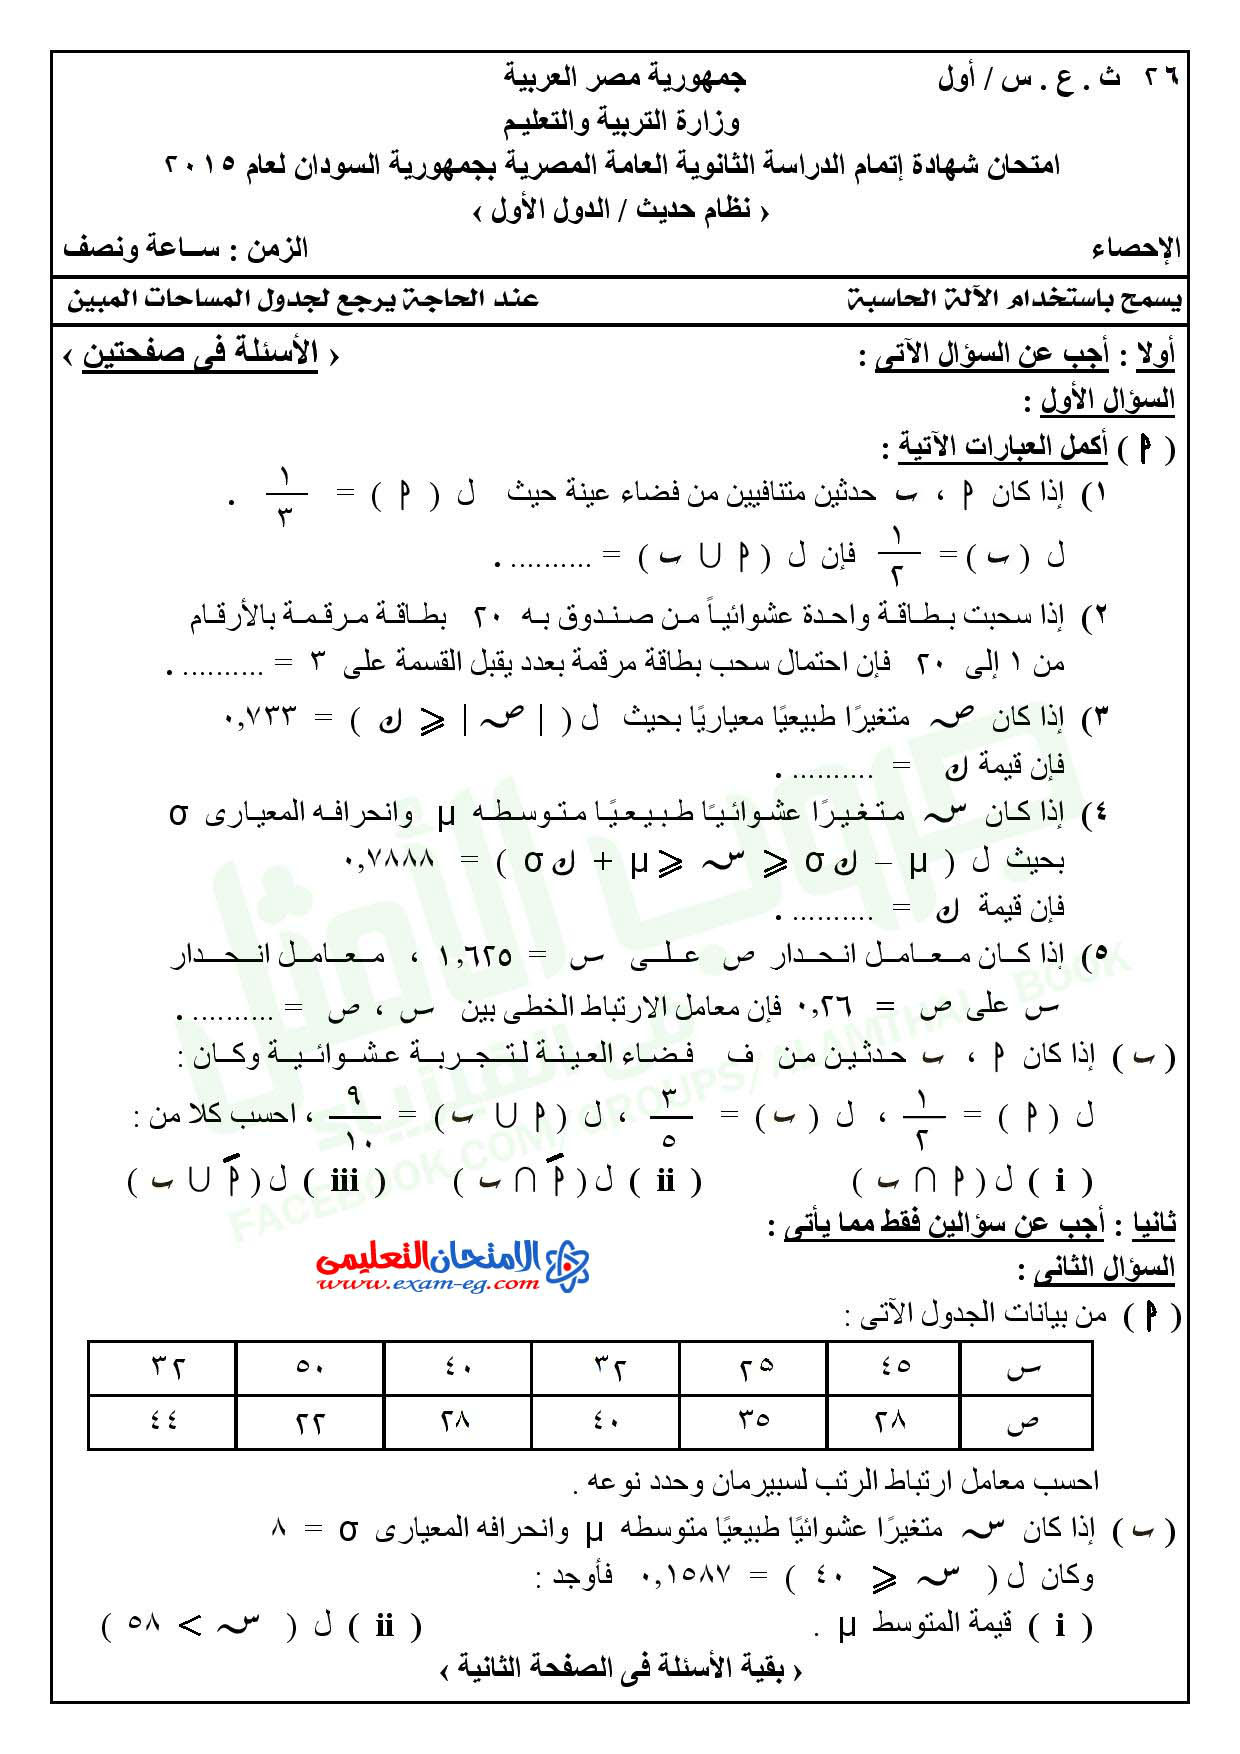 exam-eg.com_1429366926071.jpg